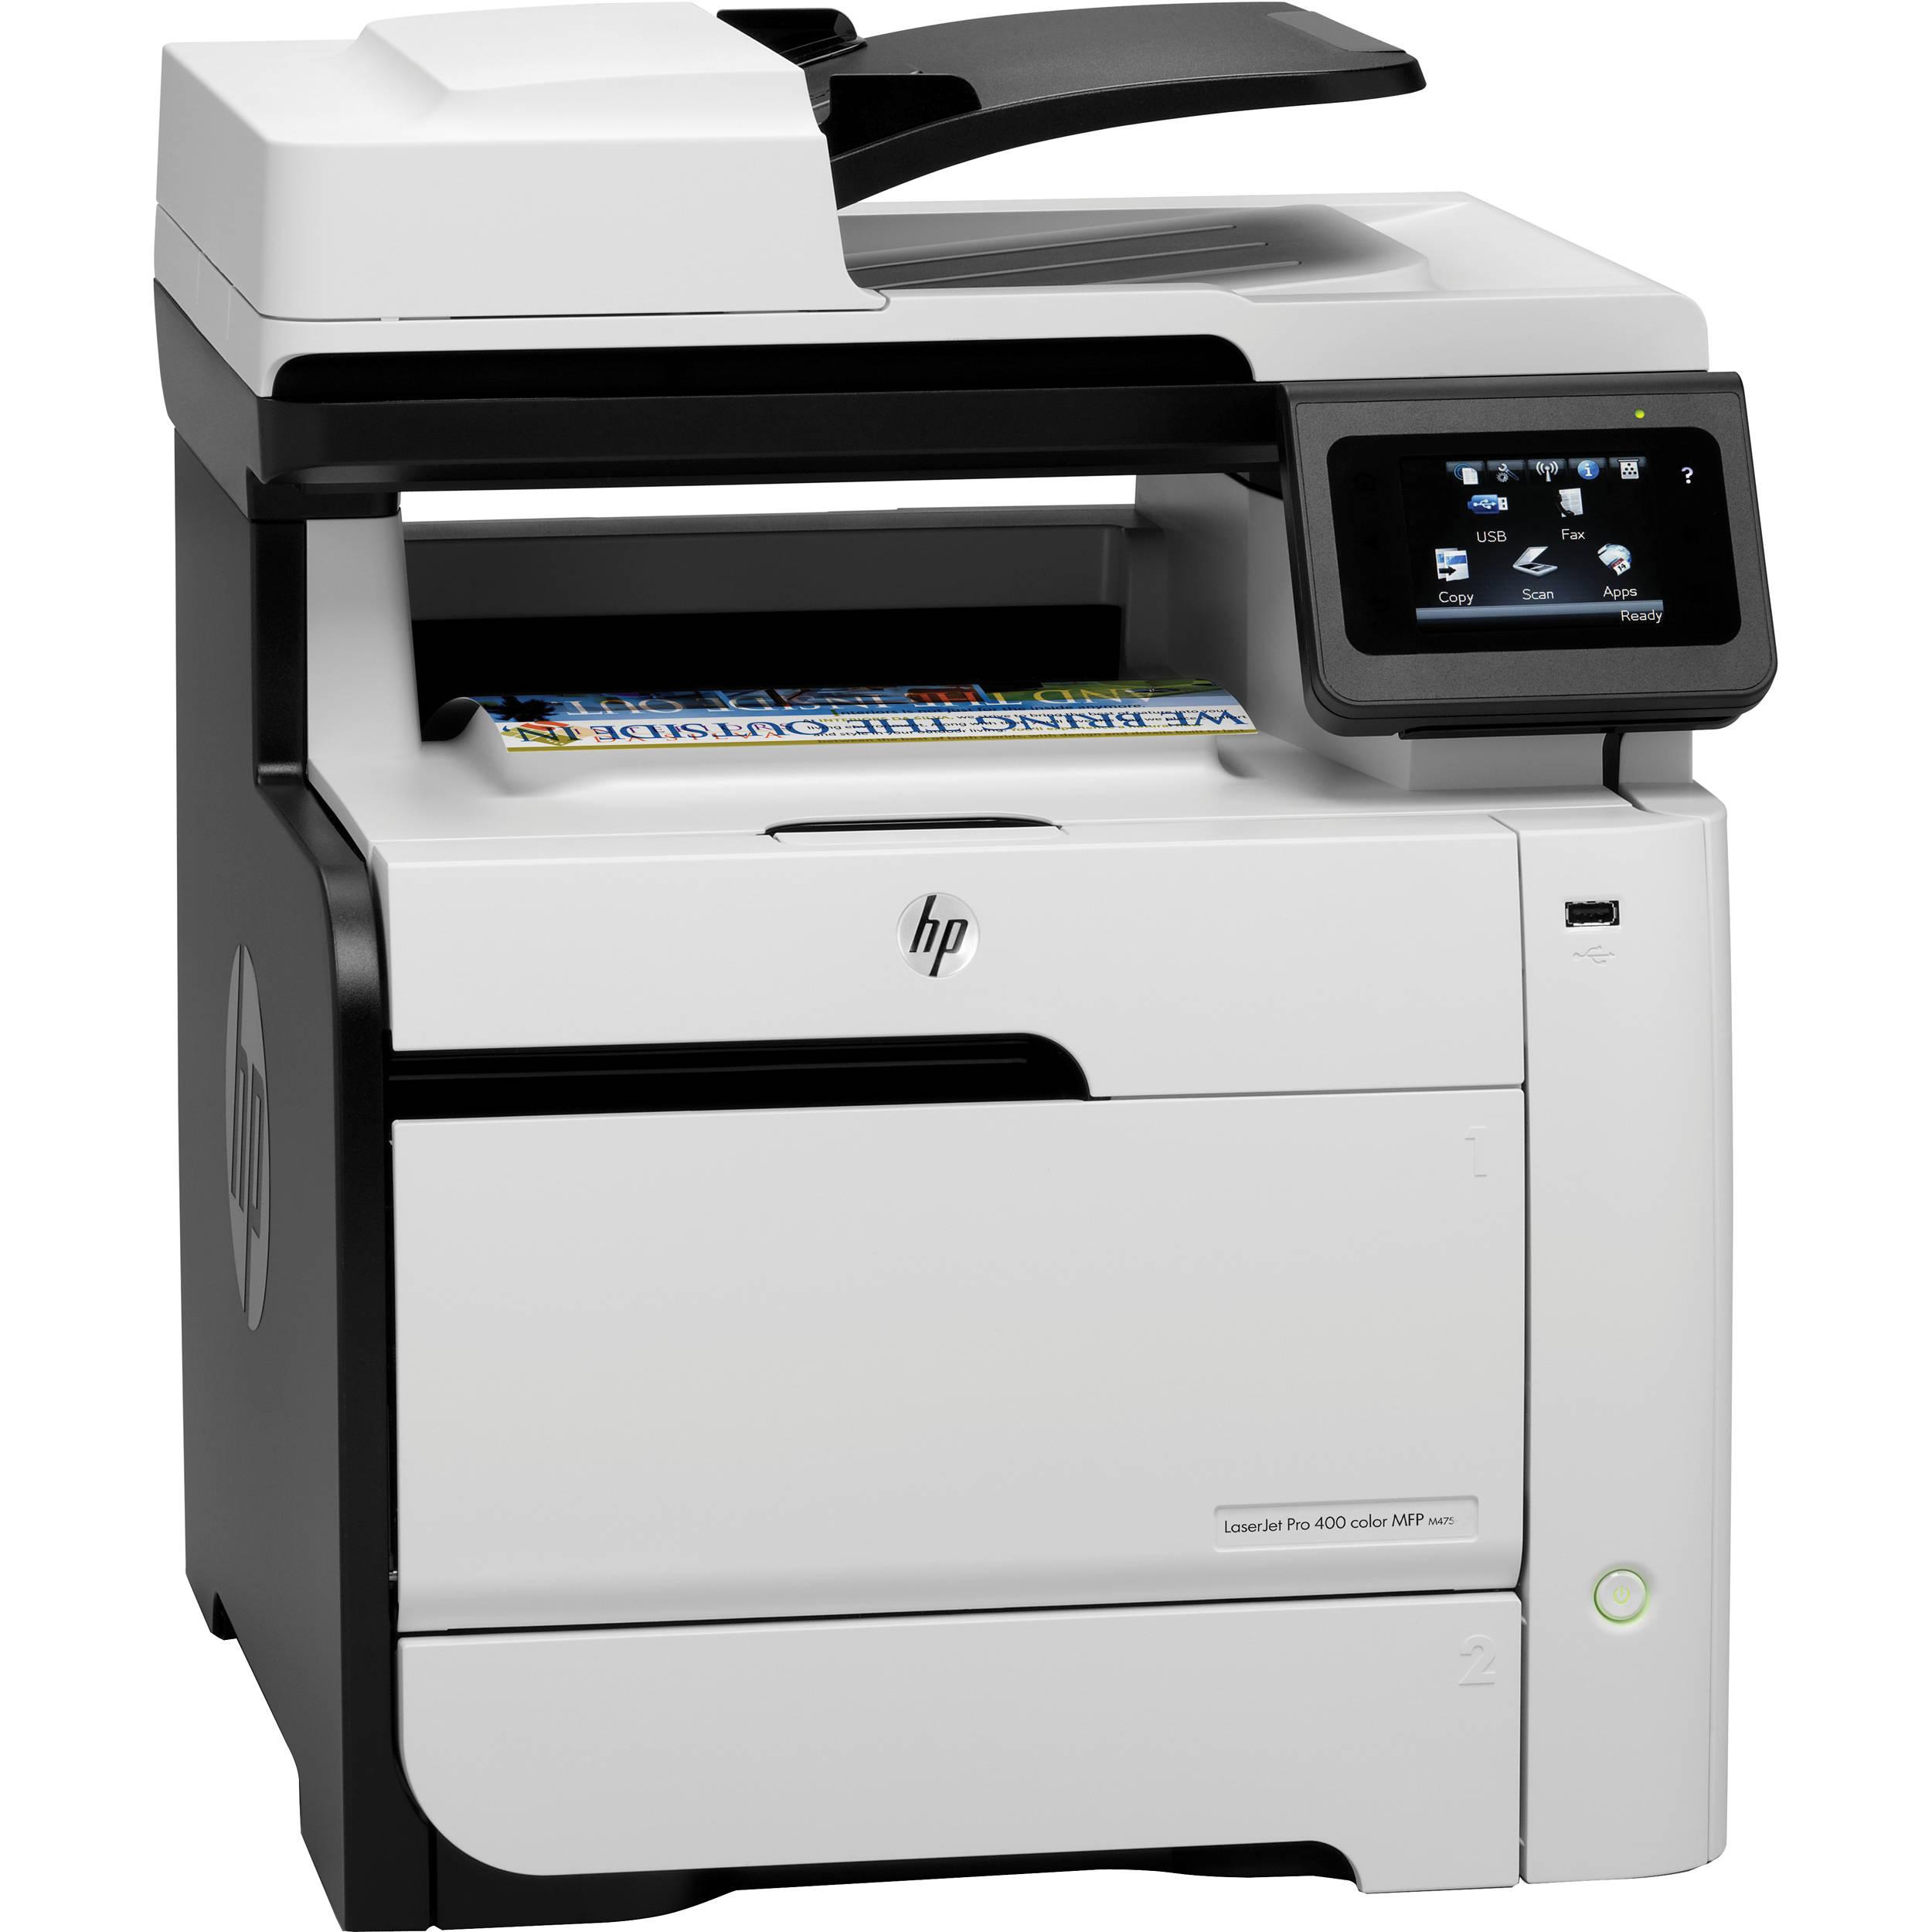 HP LaserJet Pro 400 M475dw Wireless Color All-in-One CE864A B&H